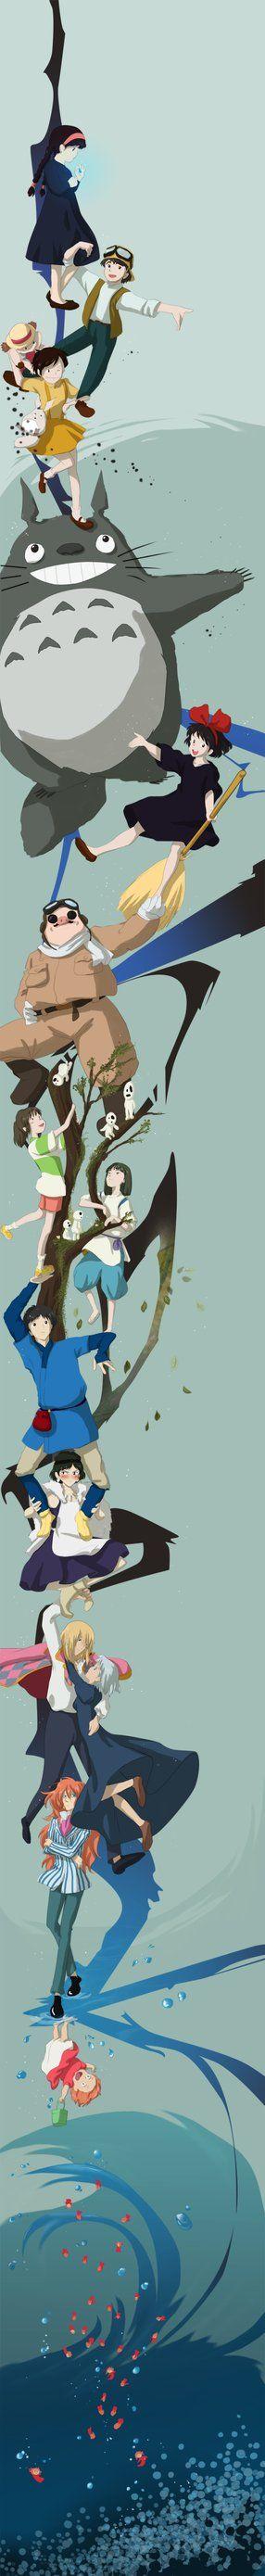 studio GhibliFilm, Studio Ghibli, Howls Moving Castles, Not Them Miyazaki, Art, Princess Mononoke, Princesses Mononoke, Studios Ghibli, Animal